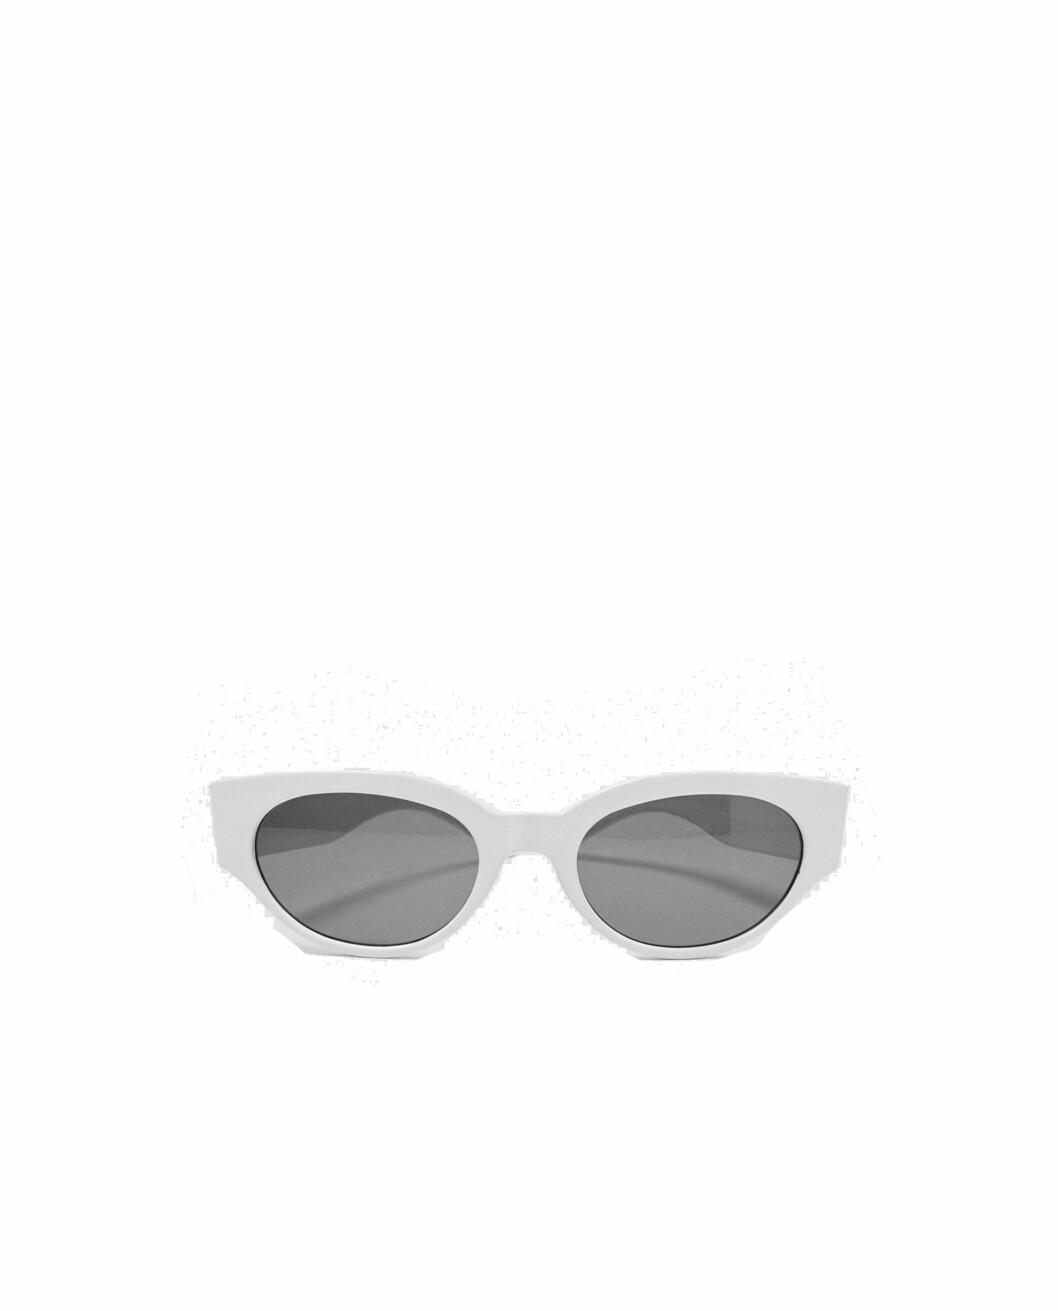 <strong>Solbriller fra Zara |199,-| https:</strong>//www.zara.com/no/no/retrofuturistiske-briller-p01903003.html?v1=5806568&v2=805004